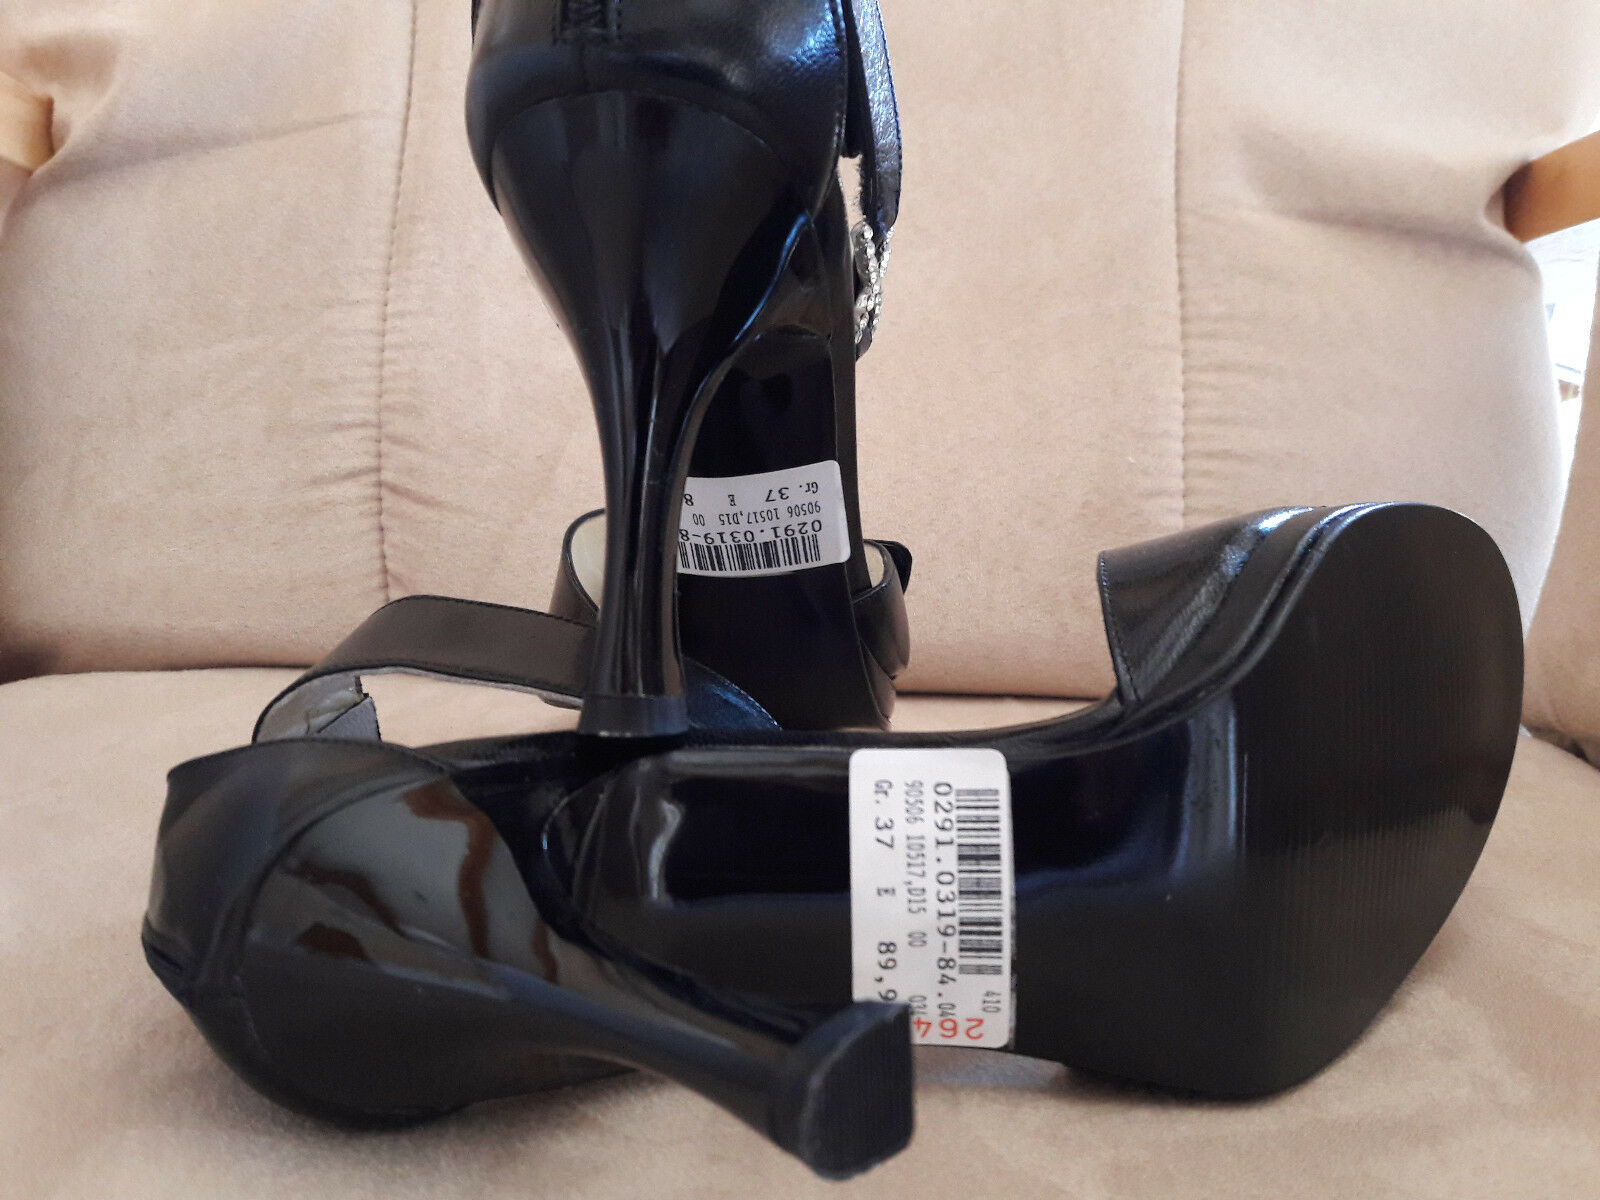 Sandalee Damen,